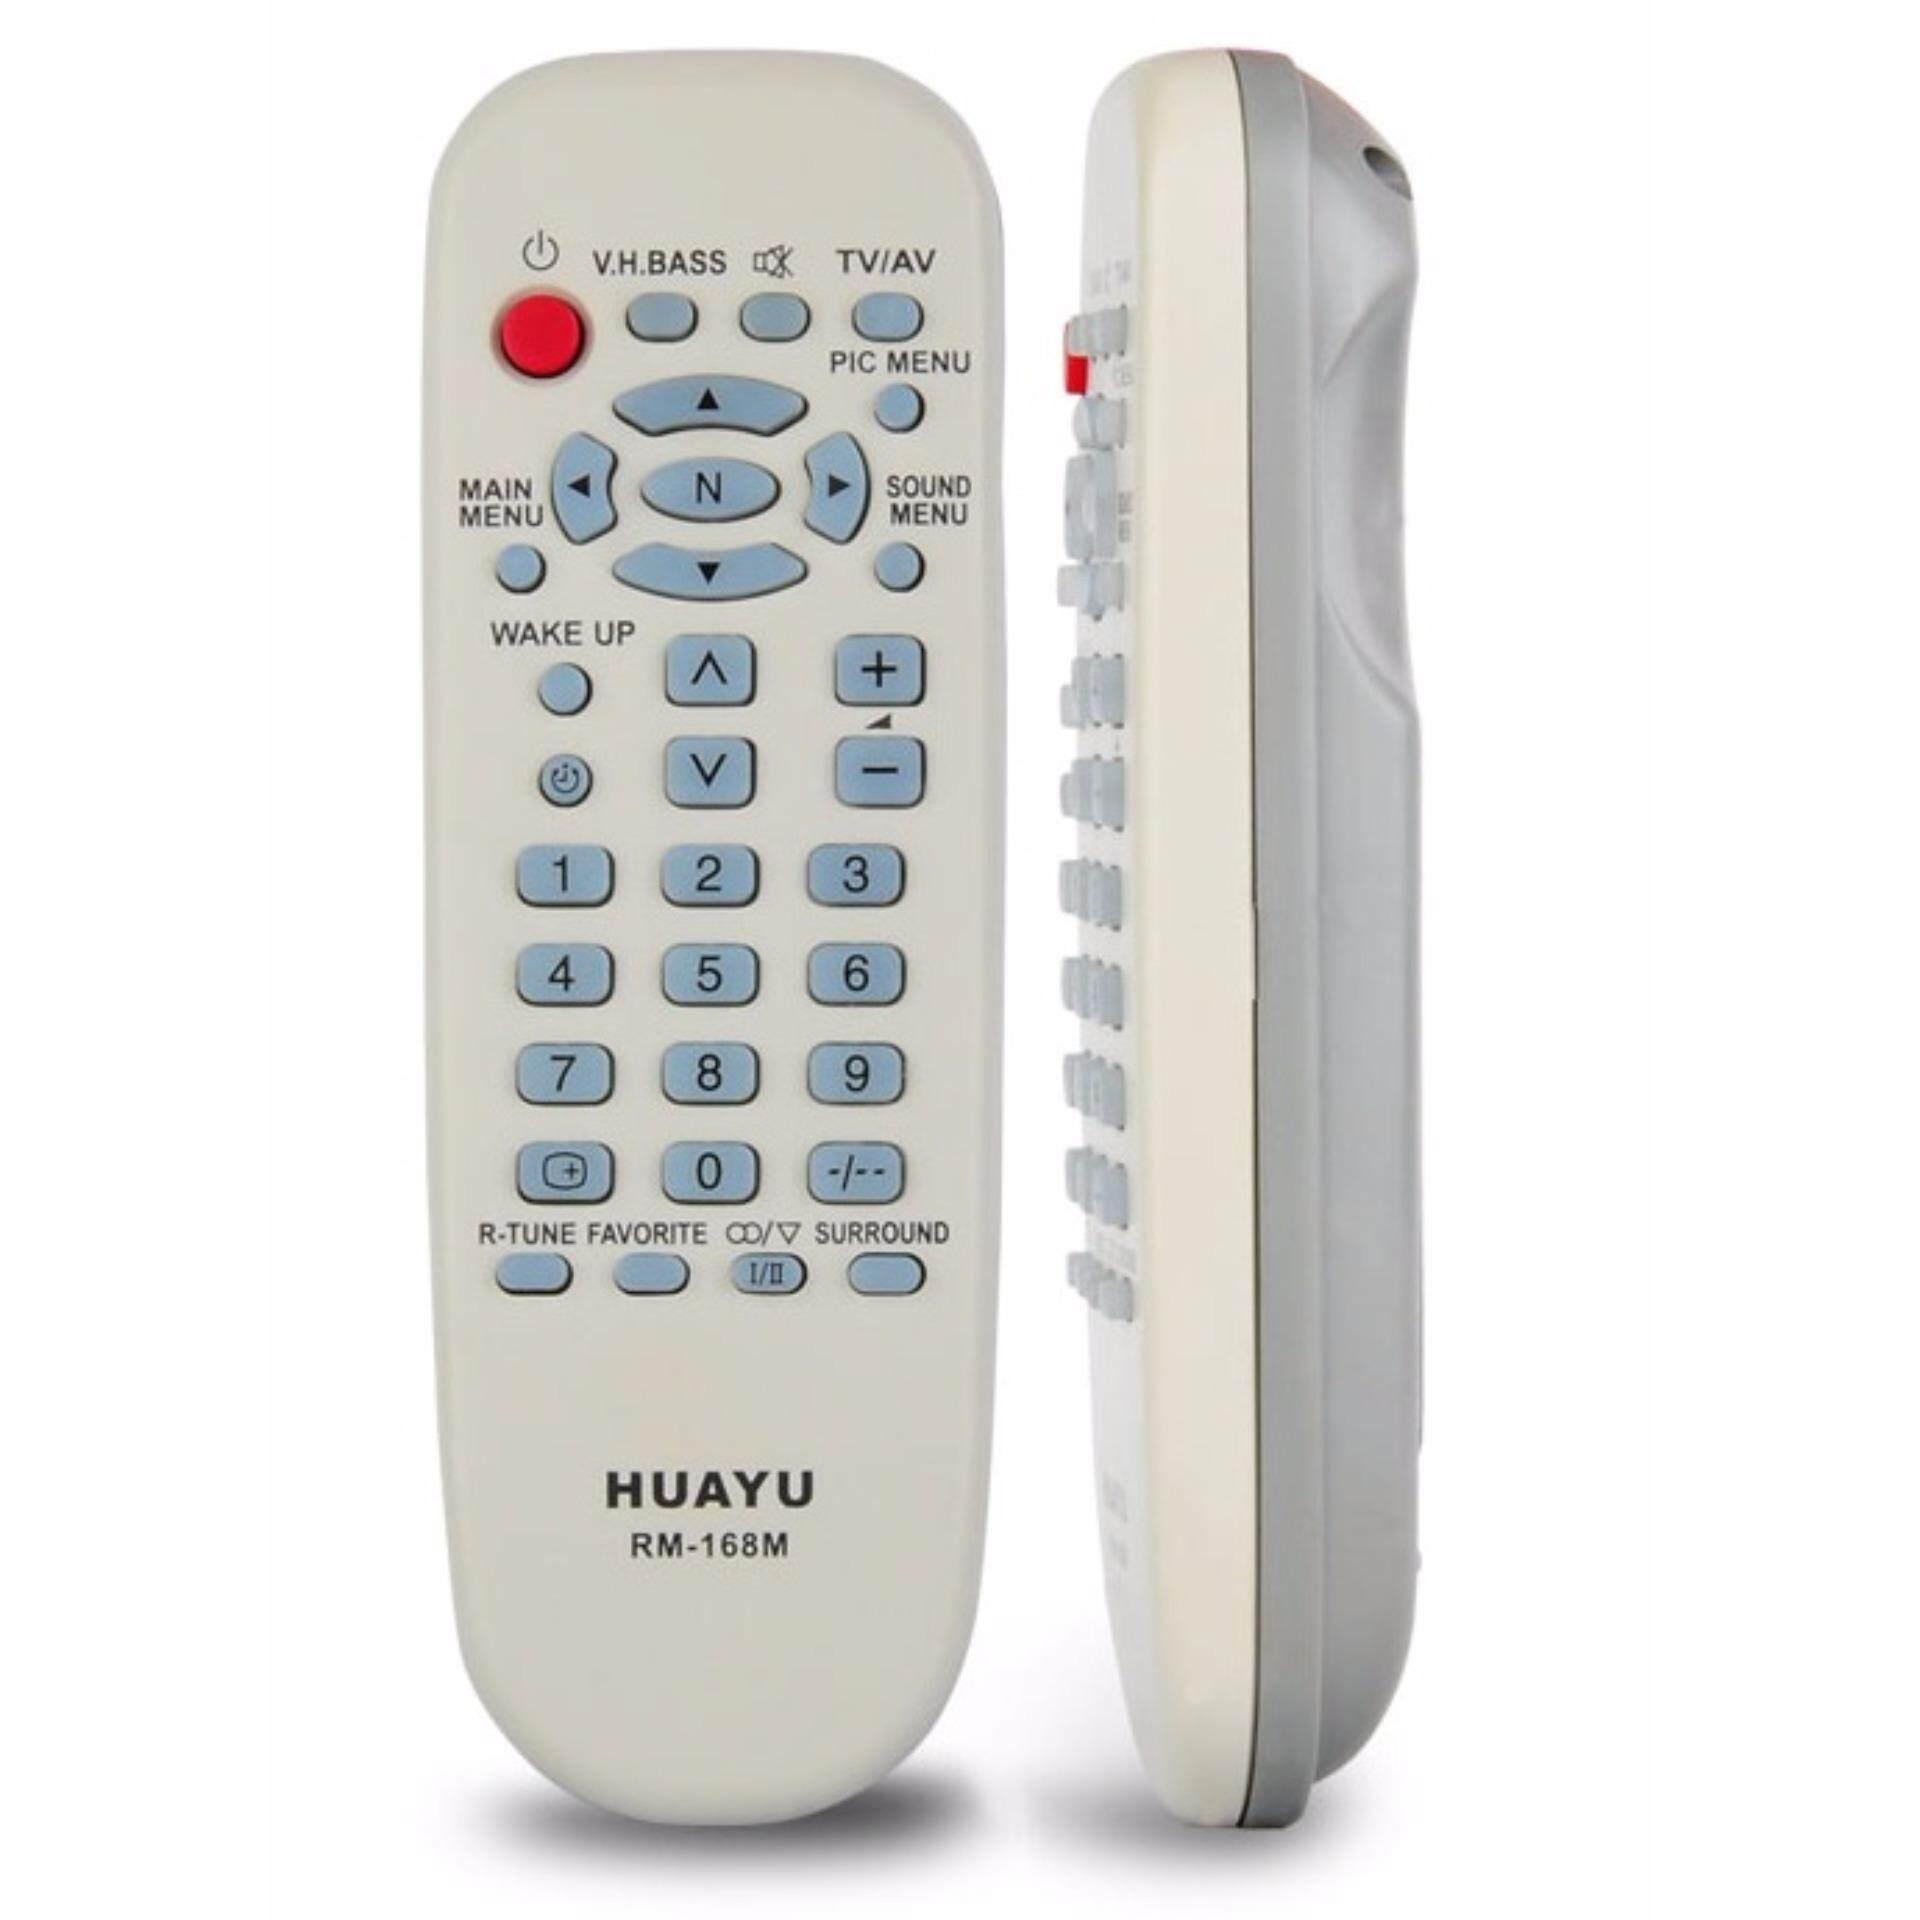 panasonic tv controller. best replacement for panasonic tv remote control-huayu 168m | lazada malaysia tv controller